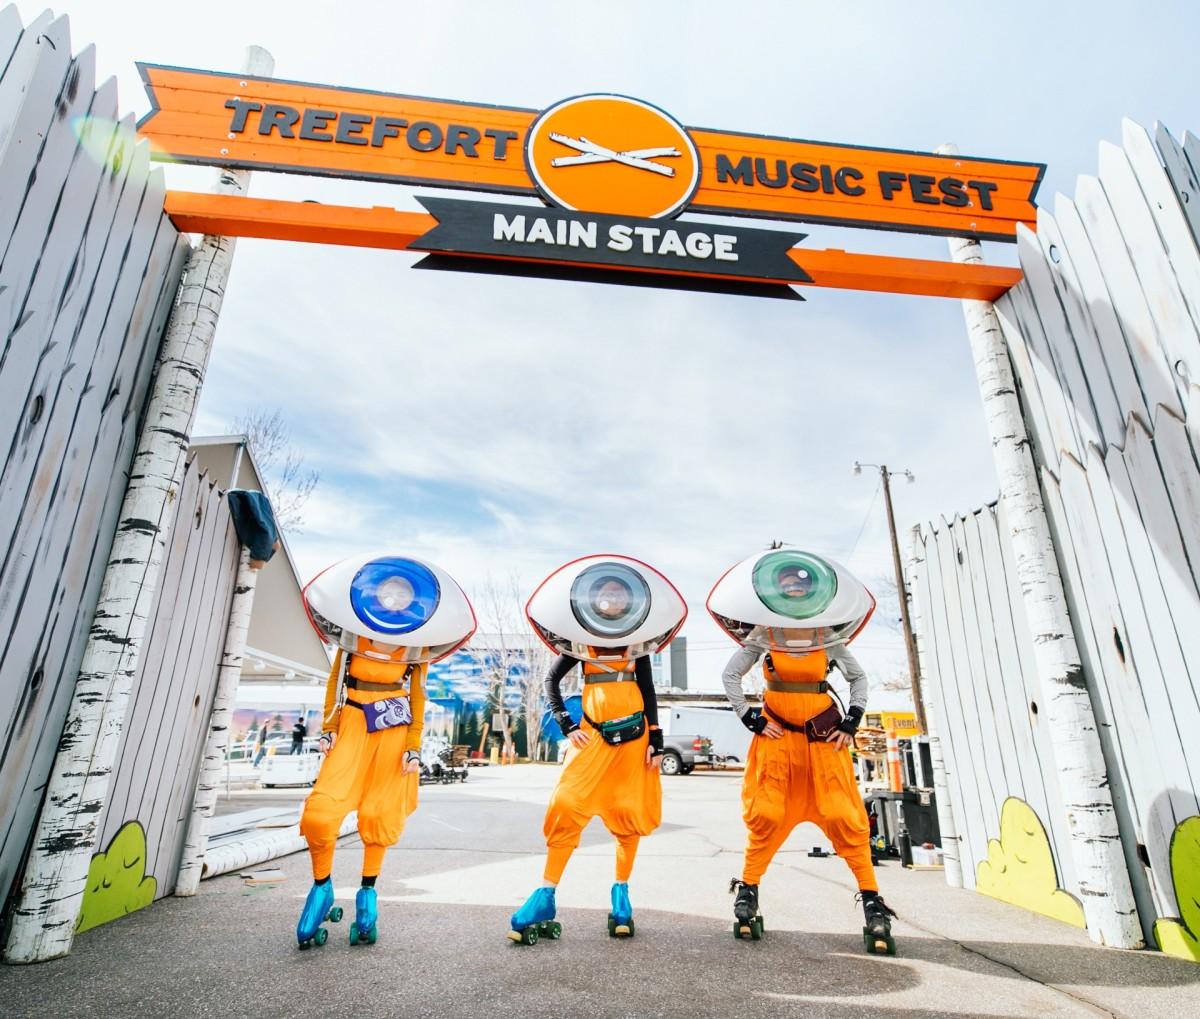 Treefort Music Festival 2019 Main Stage